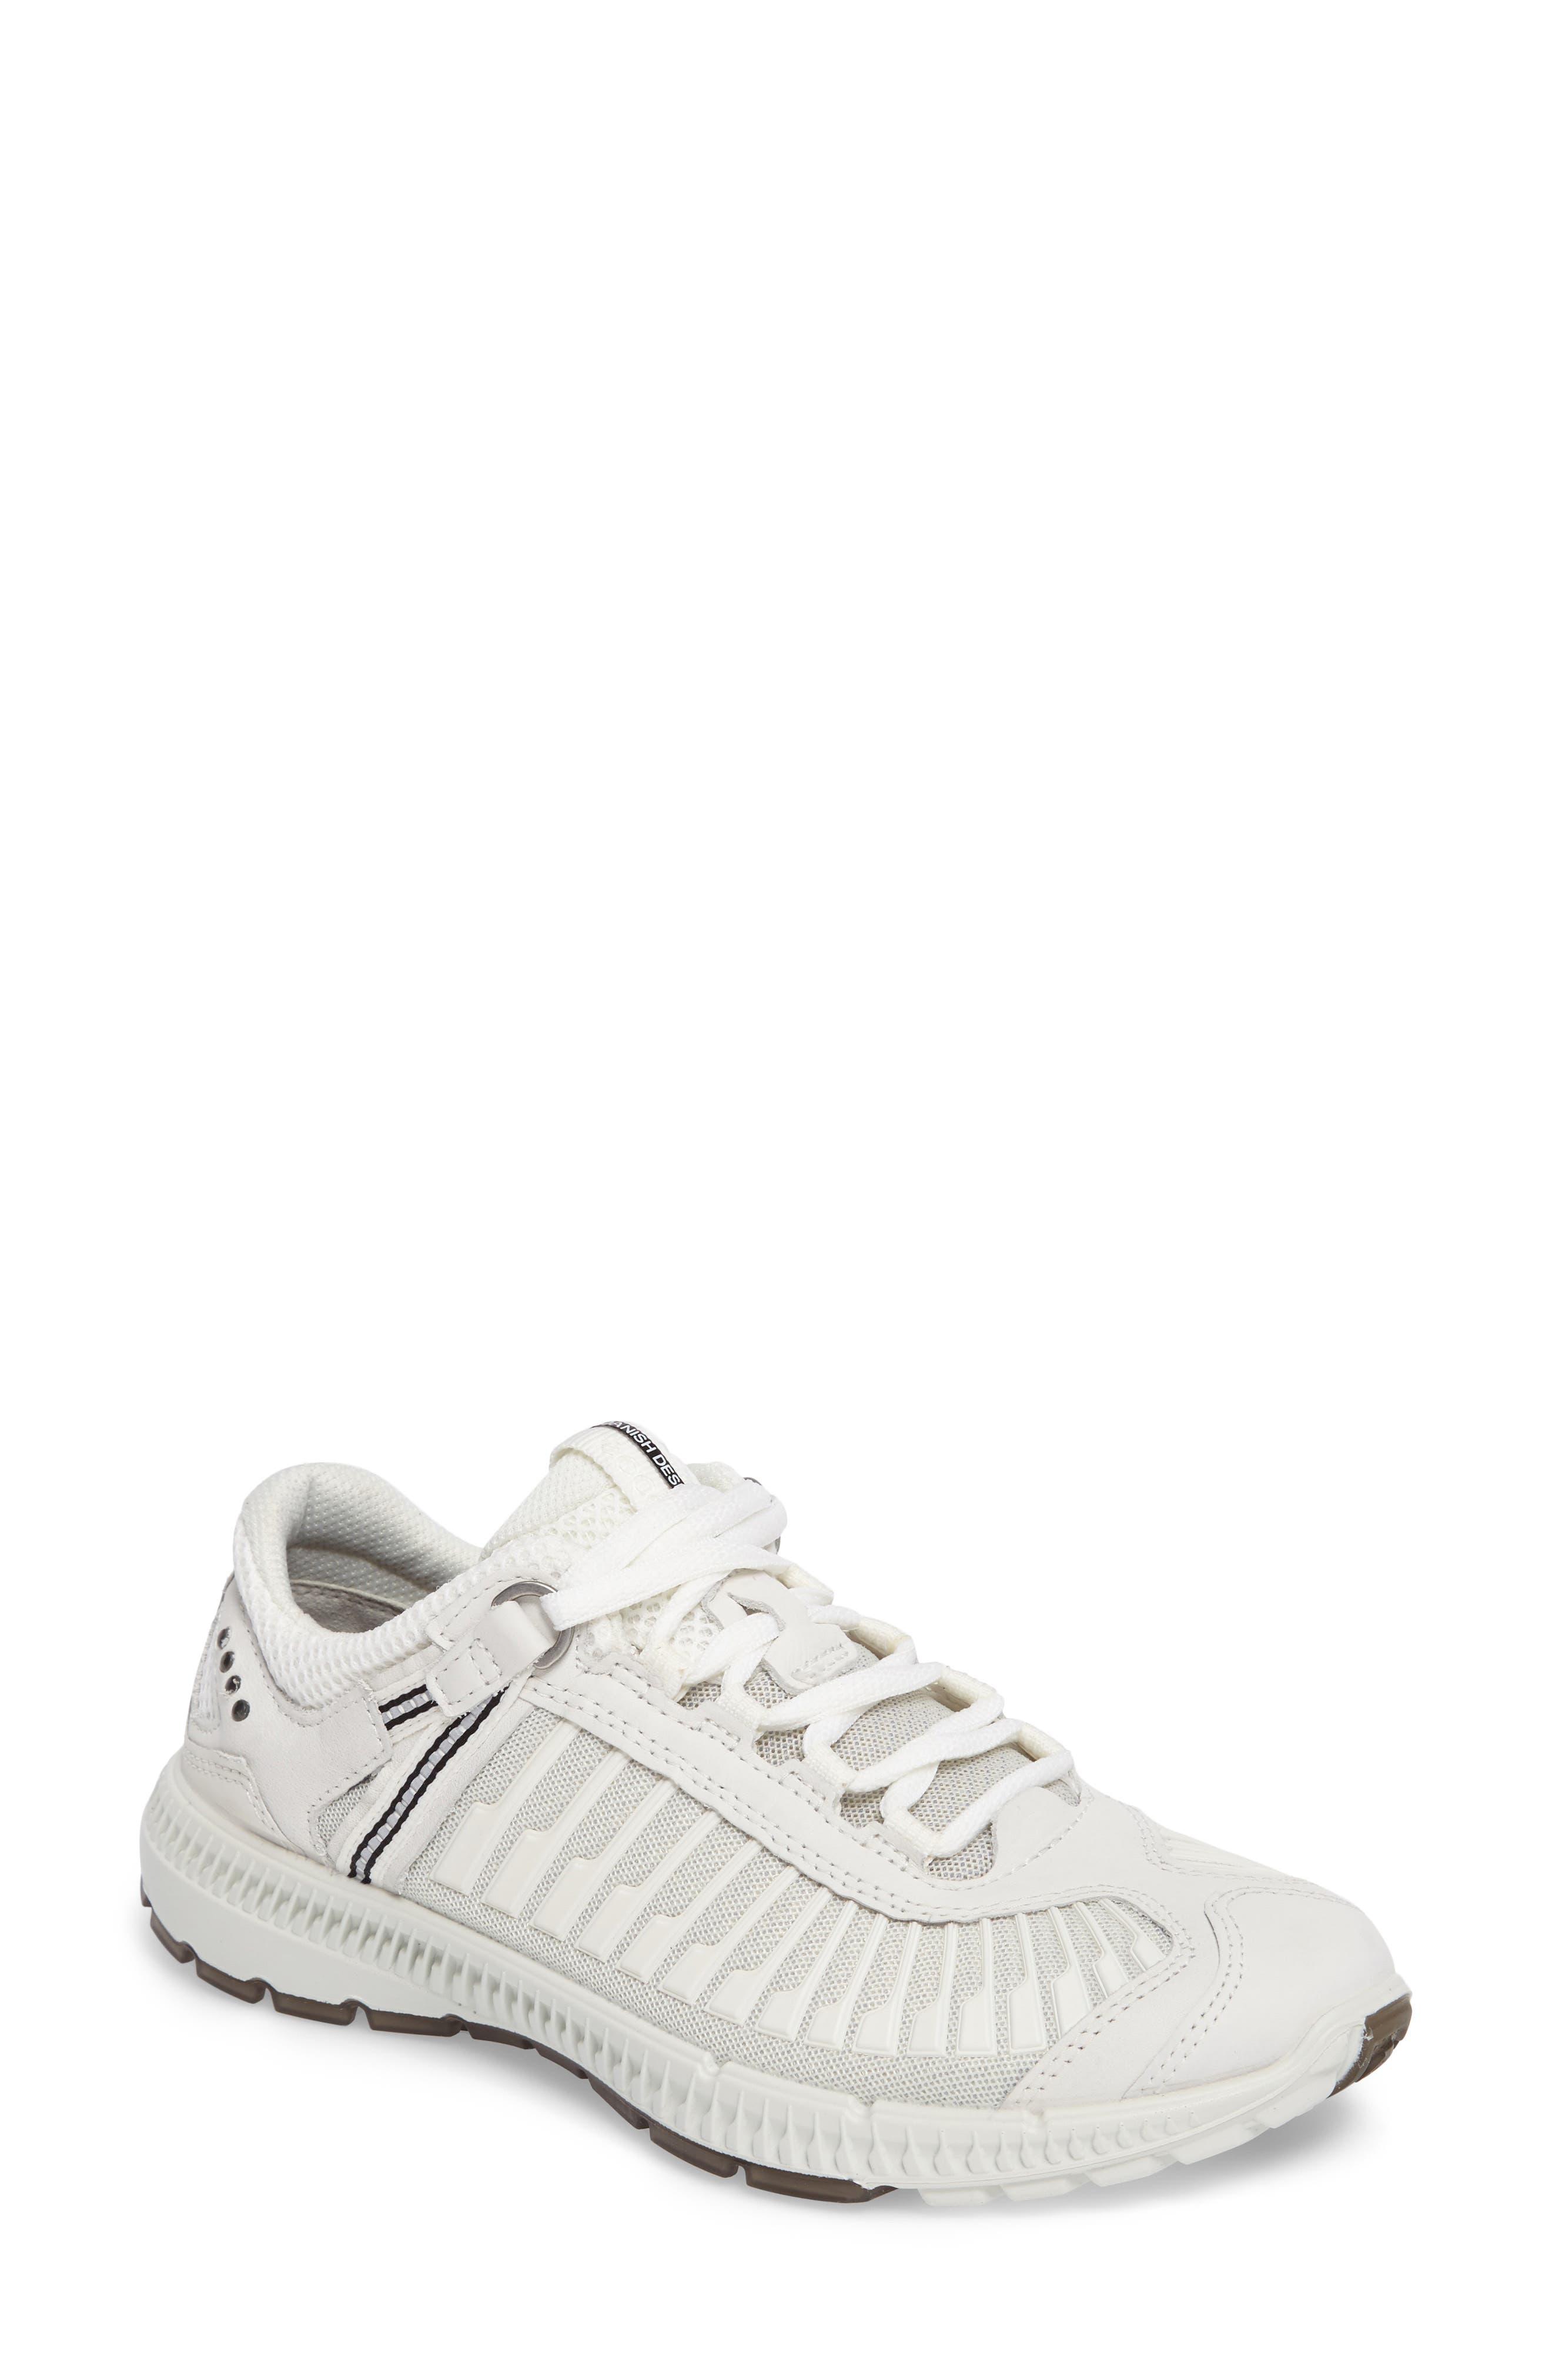 Alternate Image 1 Selected - ECCO Intrinsic TR Run Sneaker (Women)